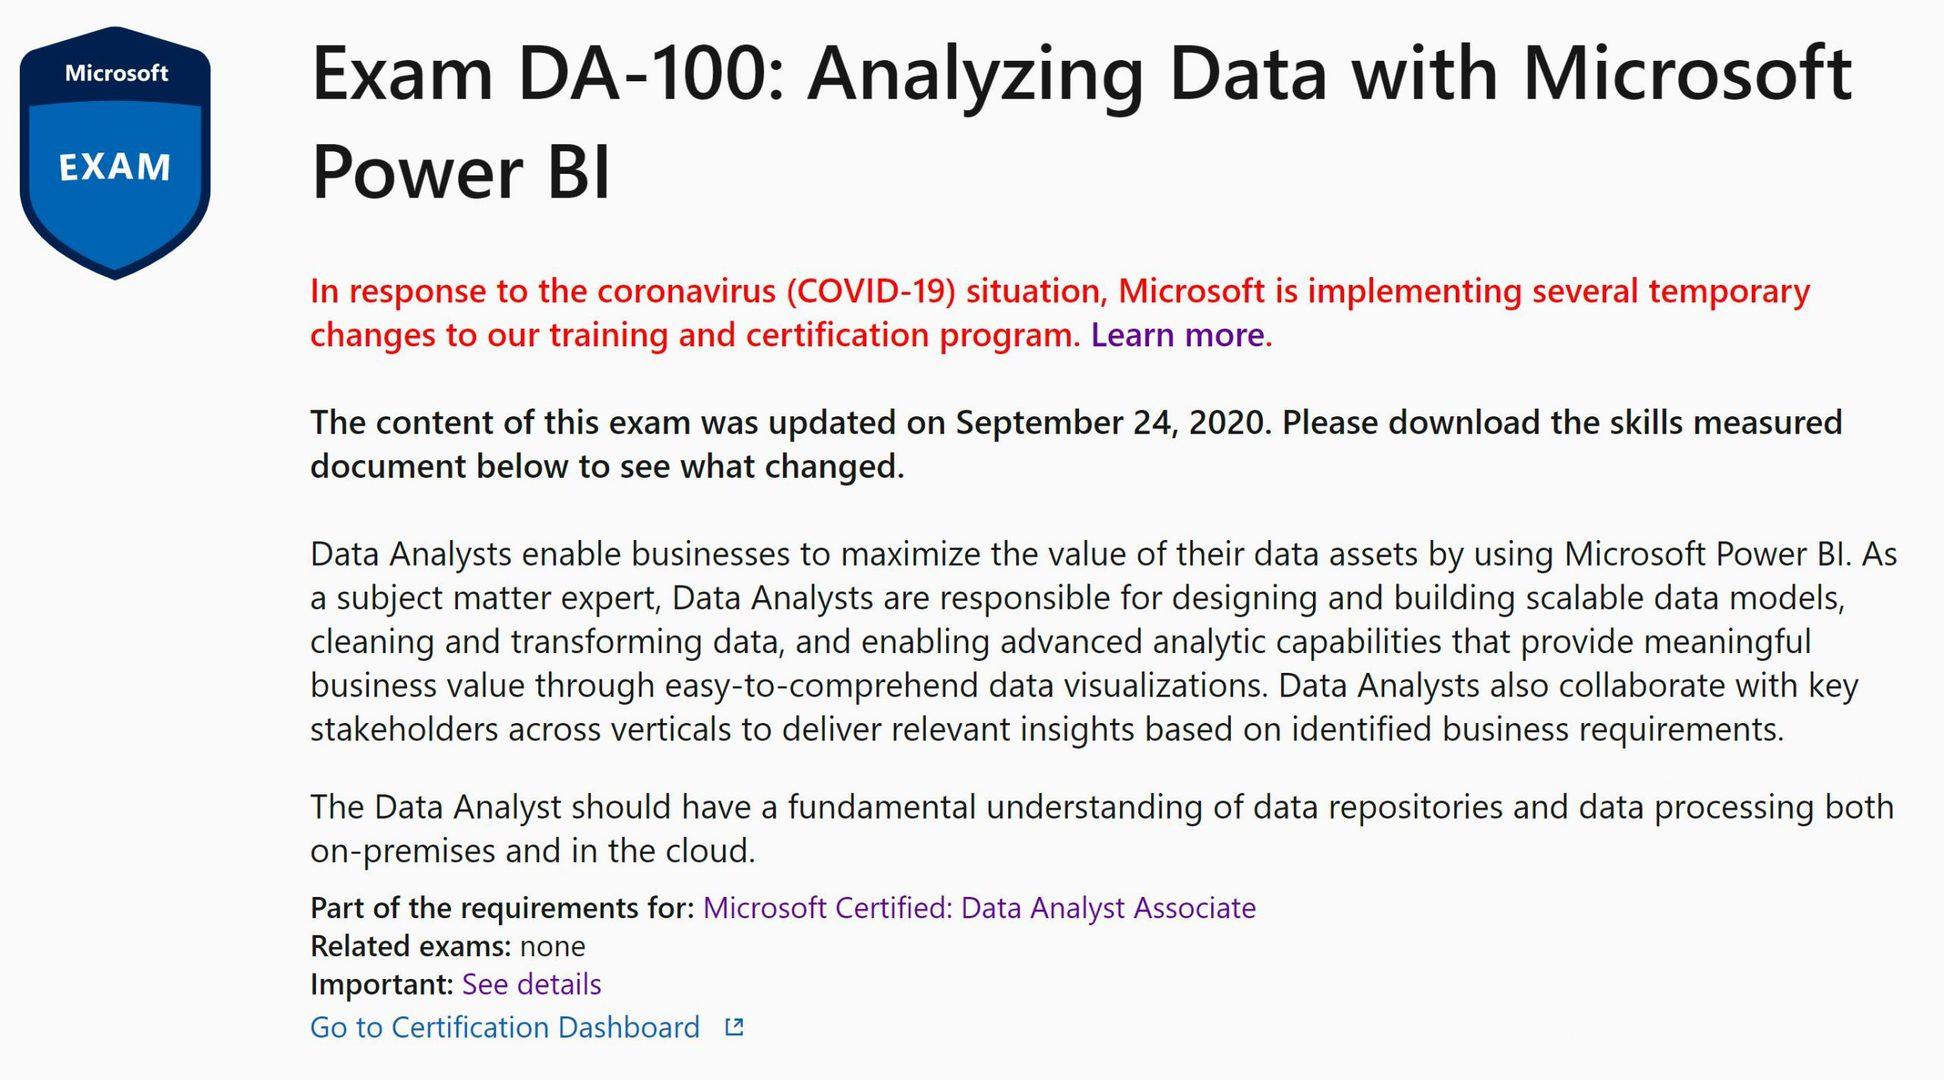 Power BI Certification Microsoft DA-100